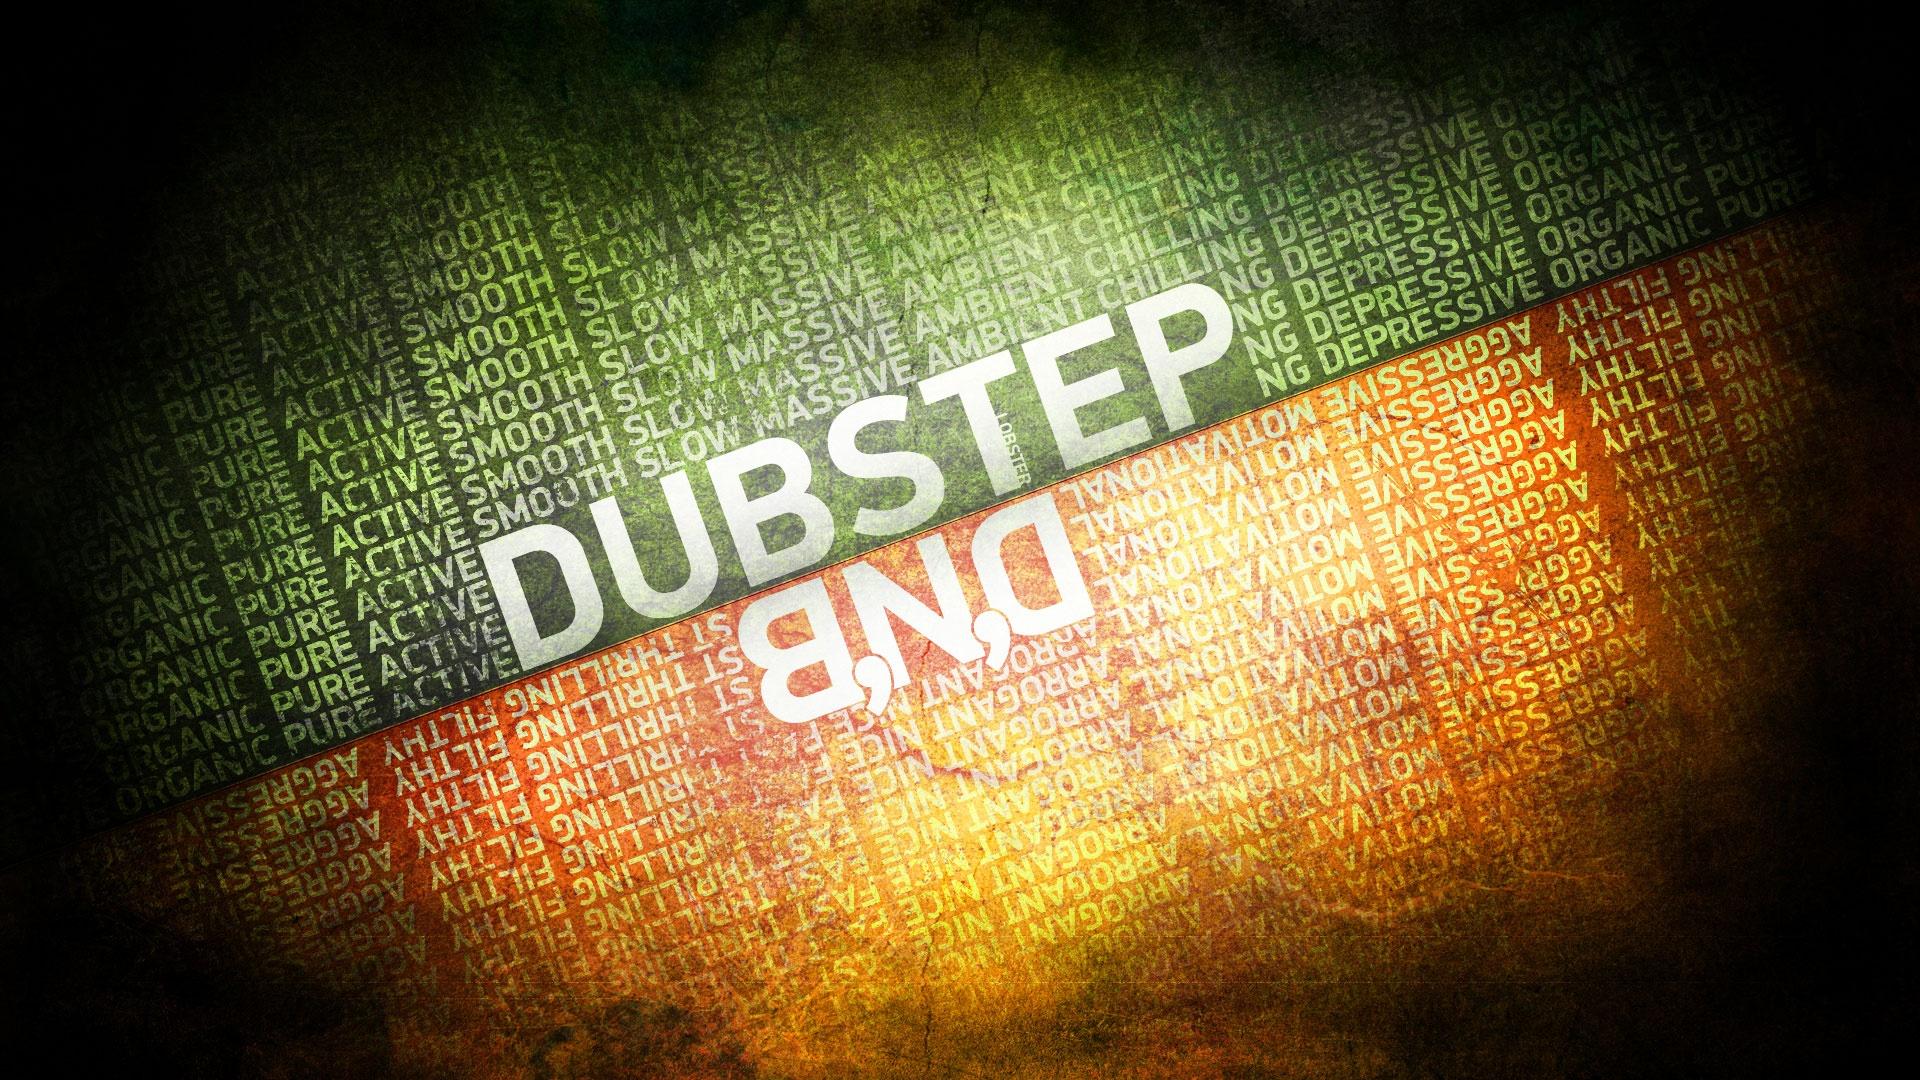 abstract dubstep wallpaper 1080p - photo #26